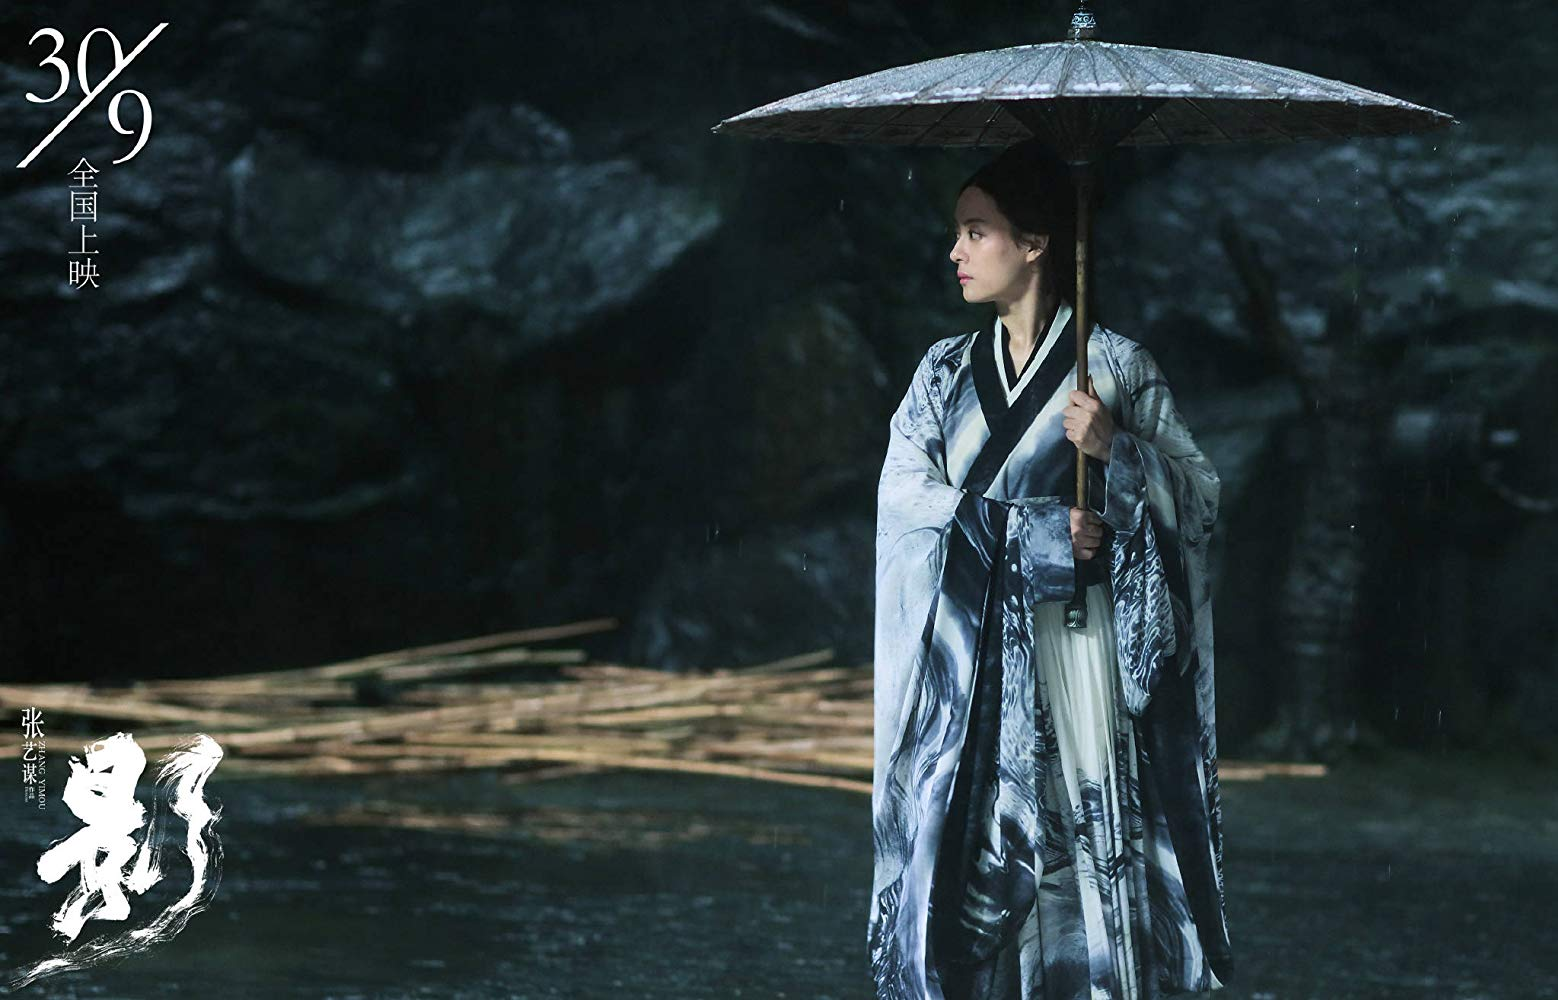 Li Sun in Ying (2018)